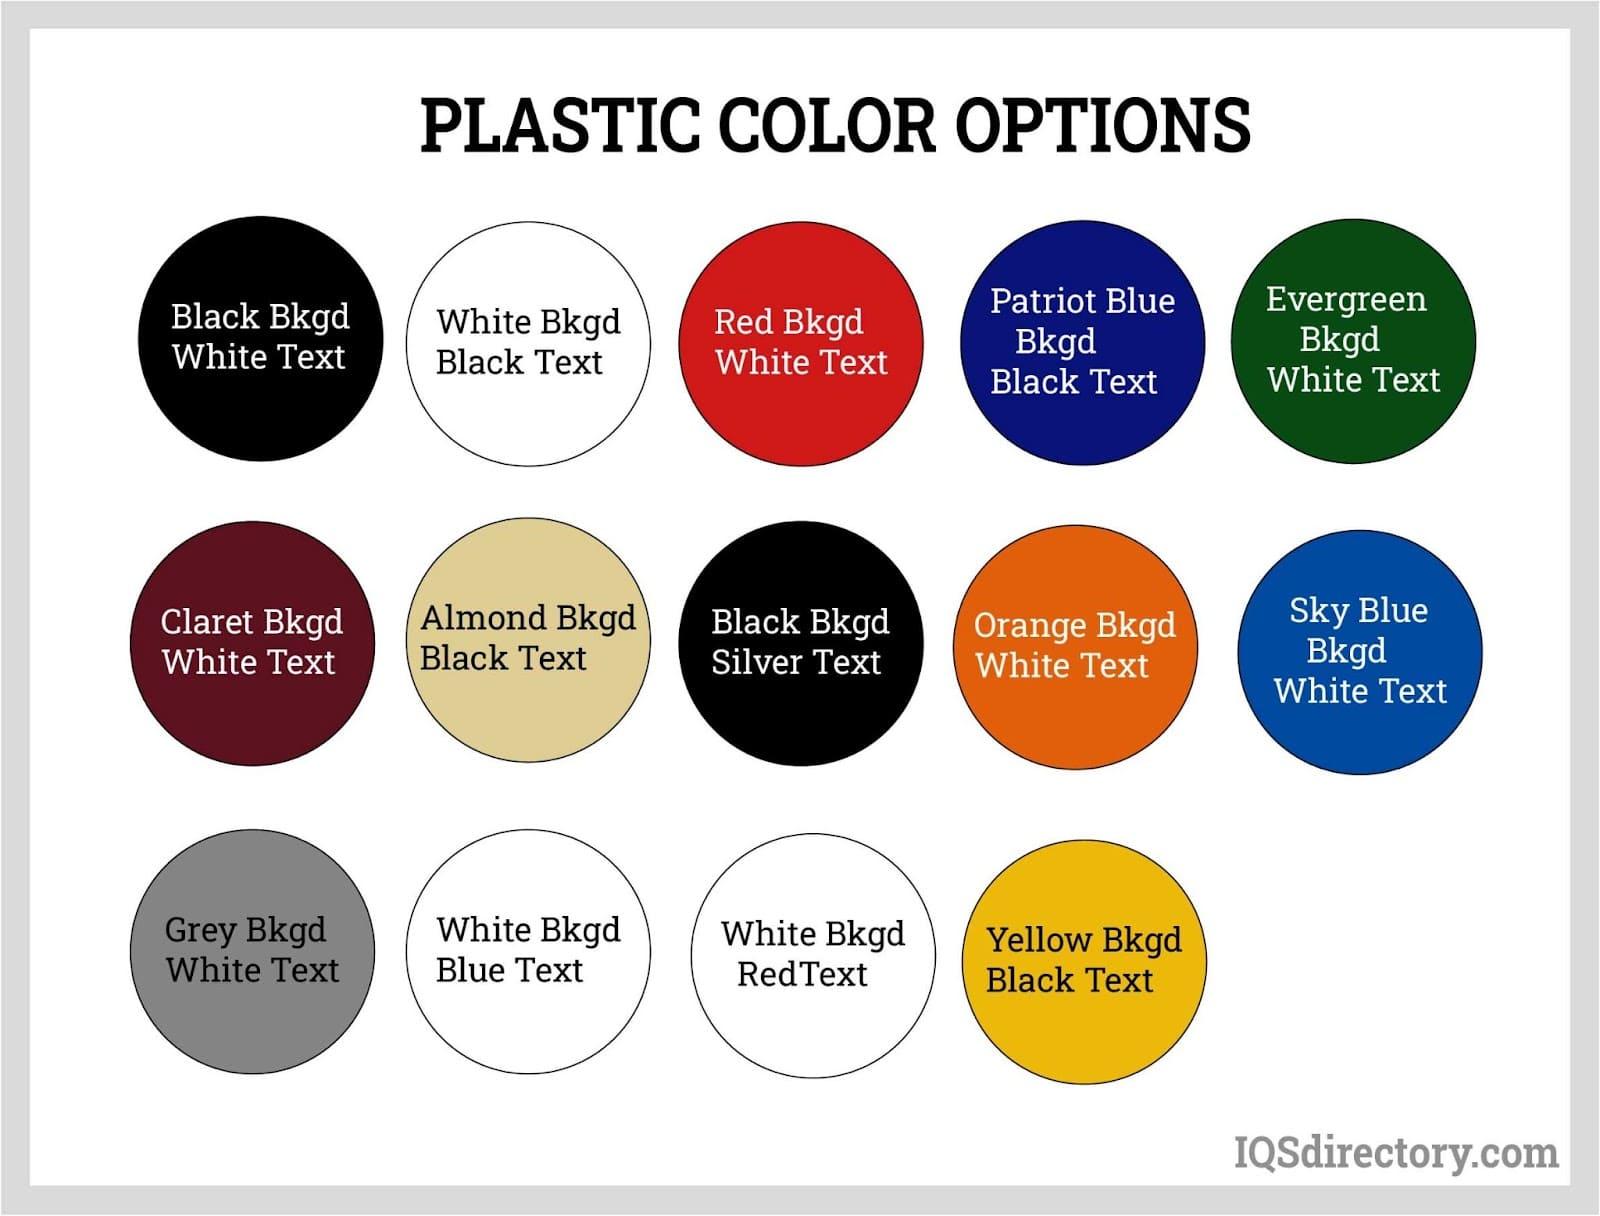 Plastic Color Options